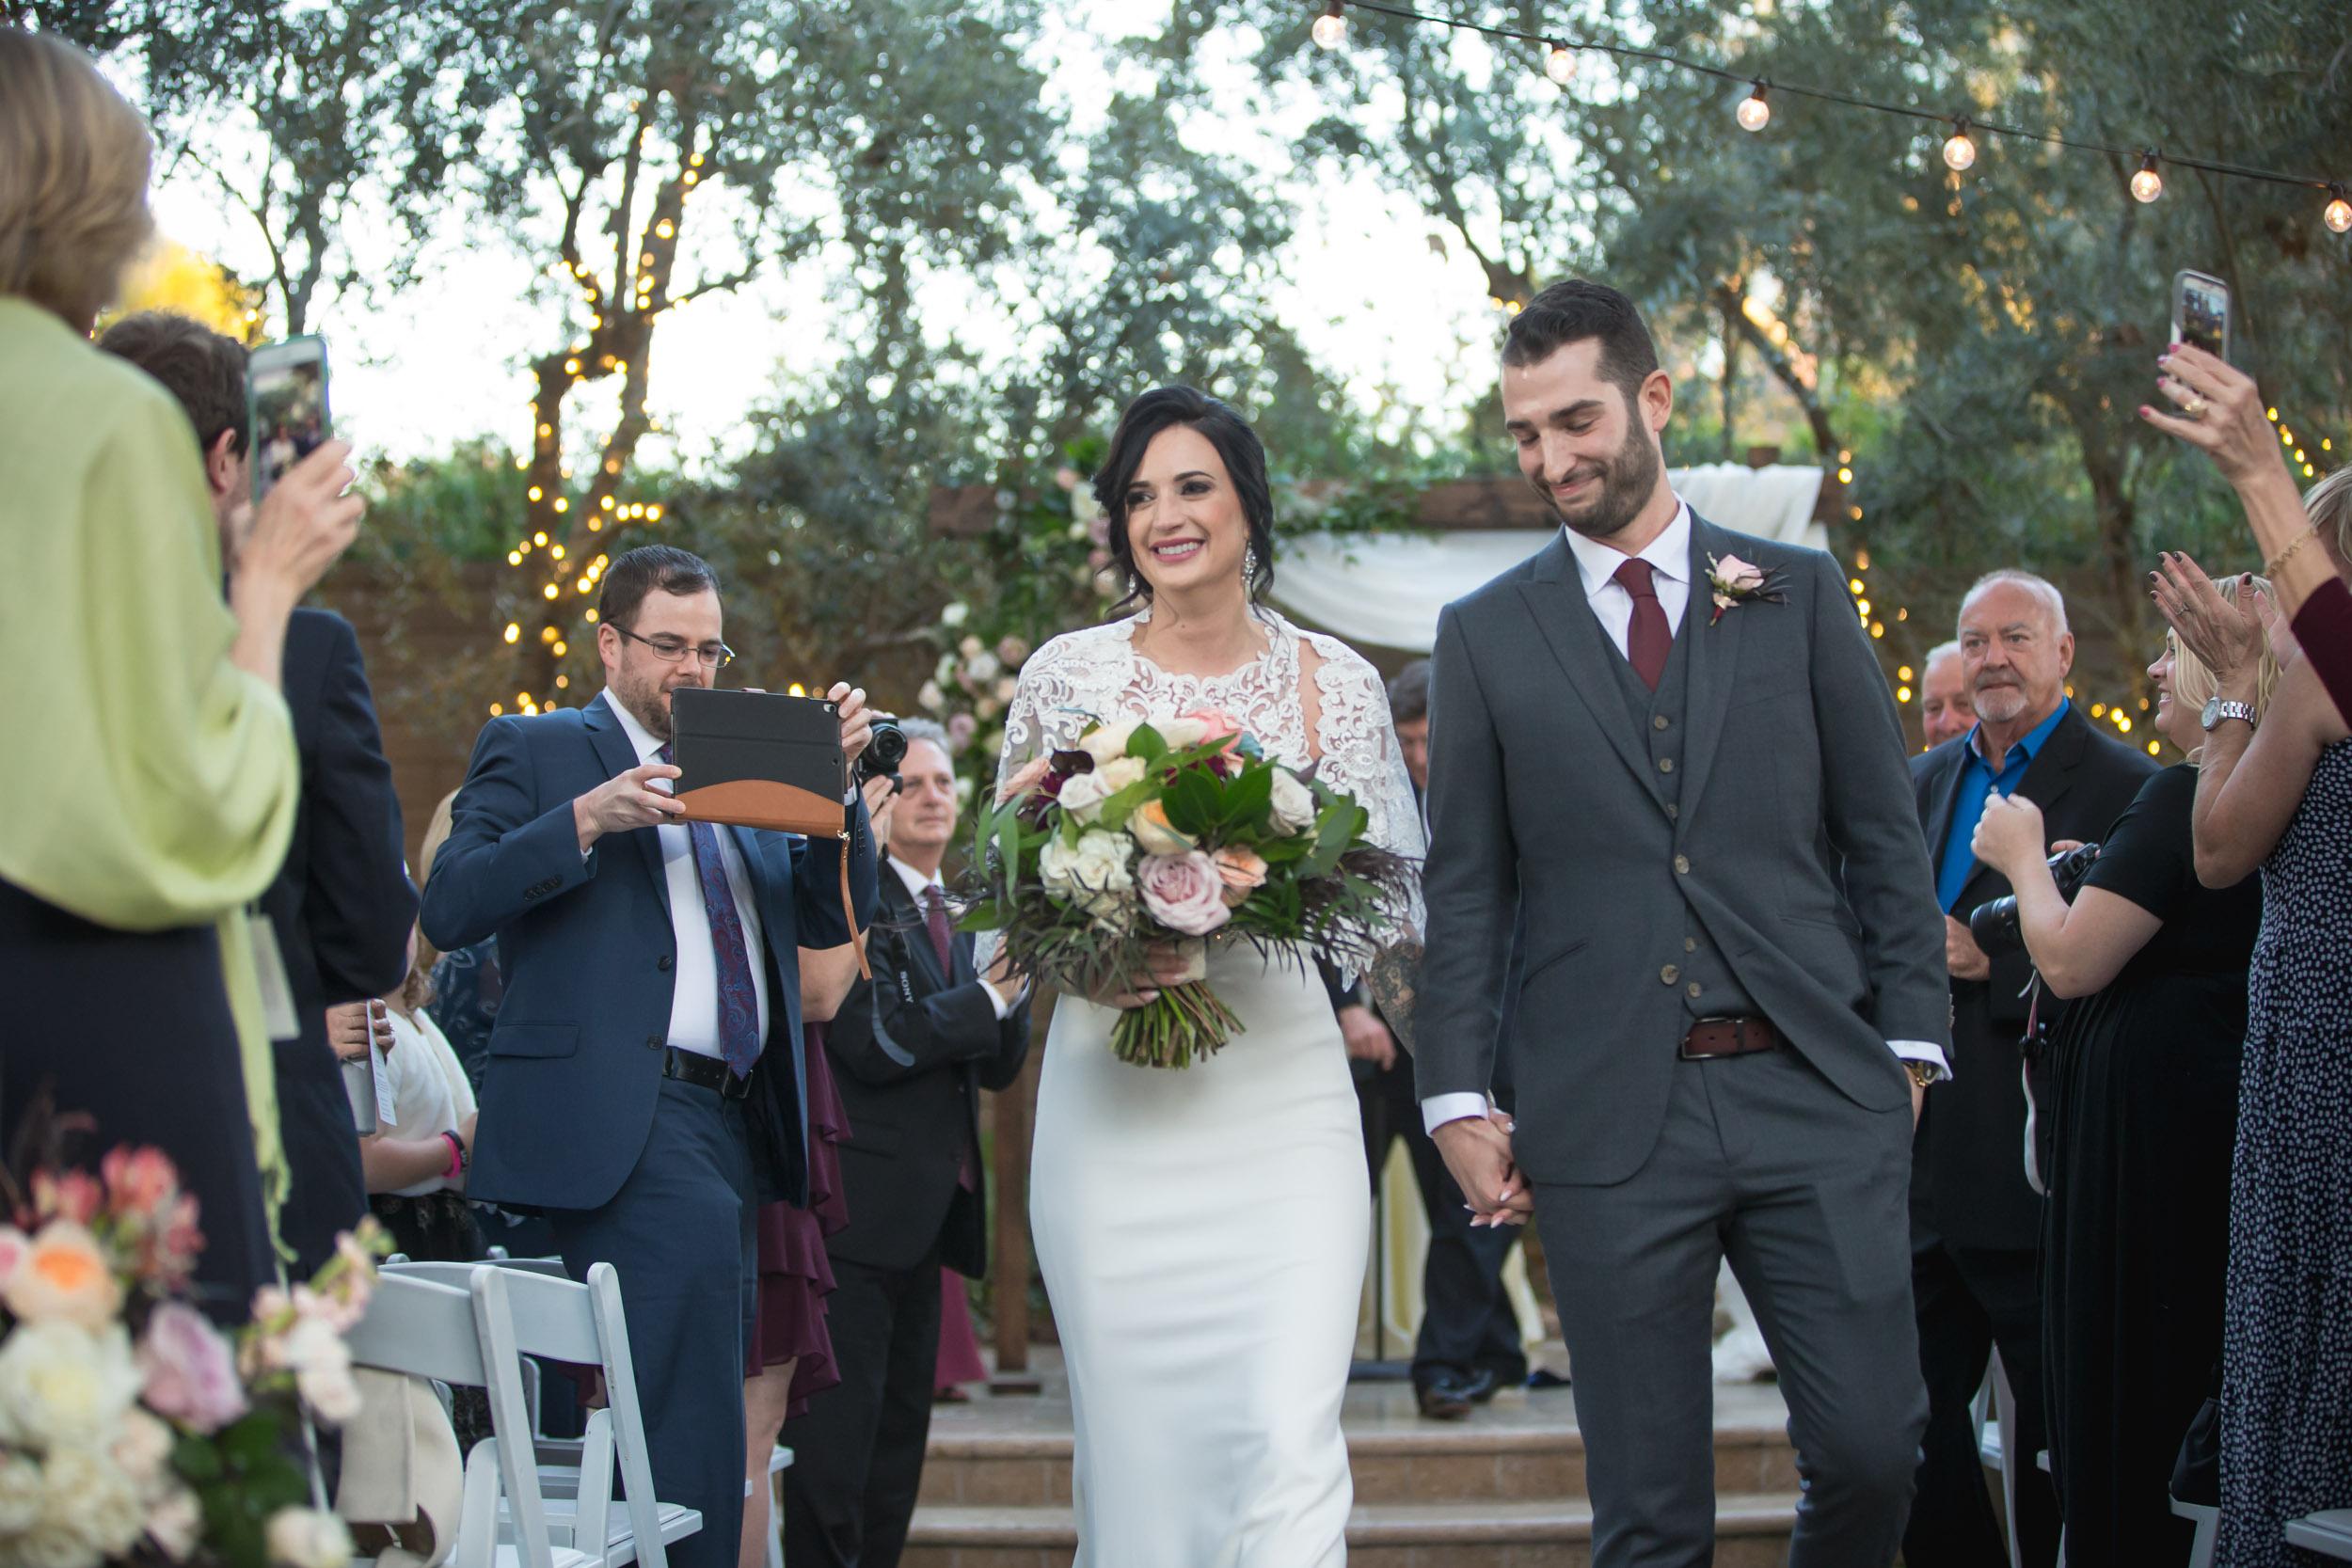 THE WEDDING OF PETER & NICOLE-732.jpg